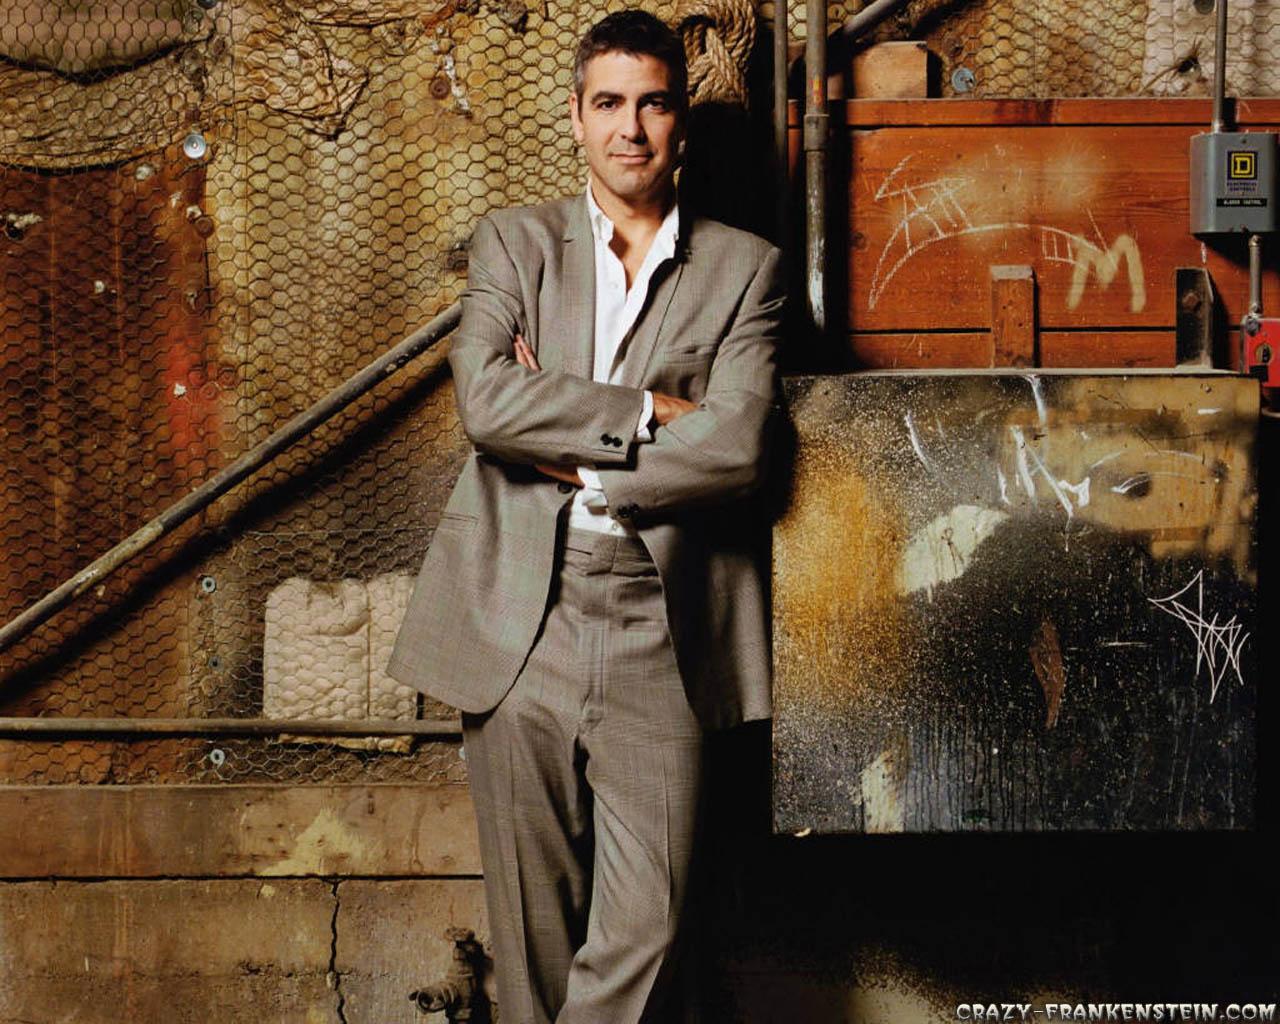 http://4.bp.blogspot.com/_hEeDlsg8wA4/TUZlvaIFTZI/AAAAAAAADLA/5Uysa4DvG1E/s1600/george-clooney-male-celebrity-wallpapers-1280x1024.jpg